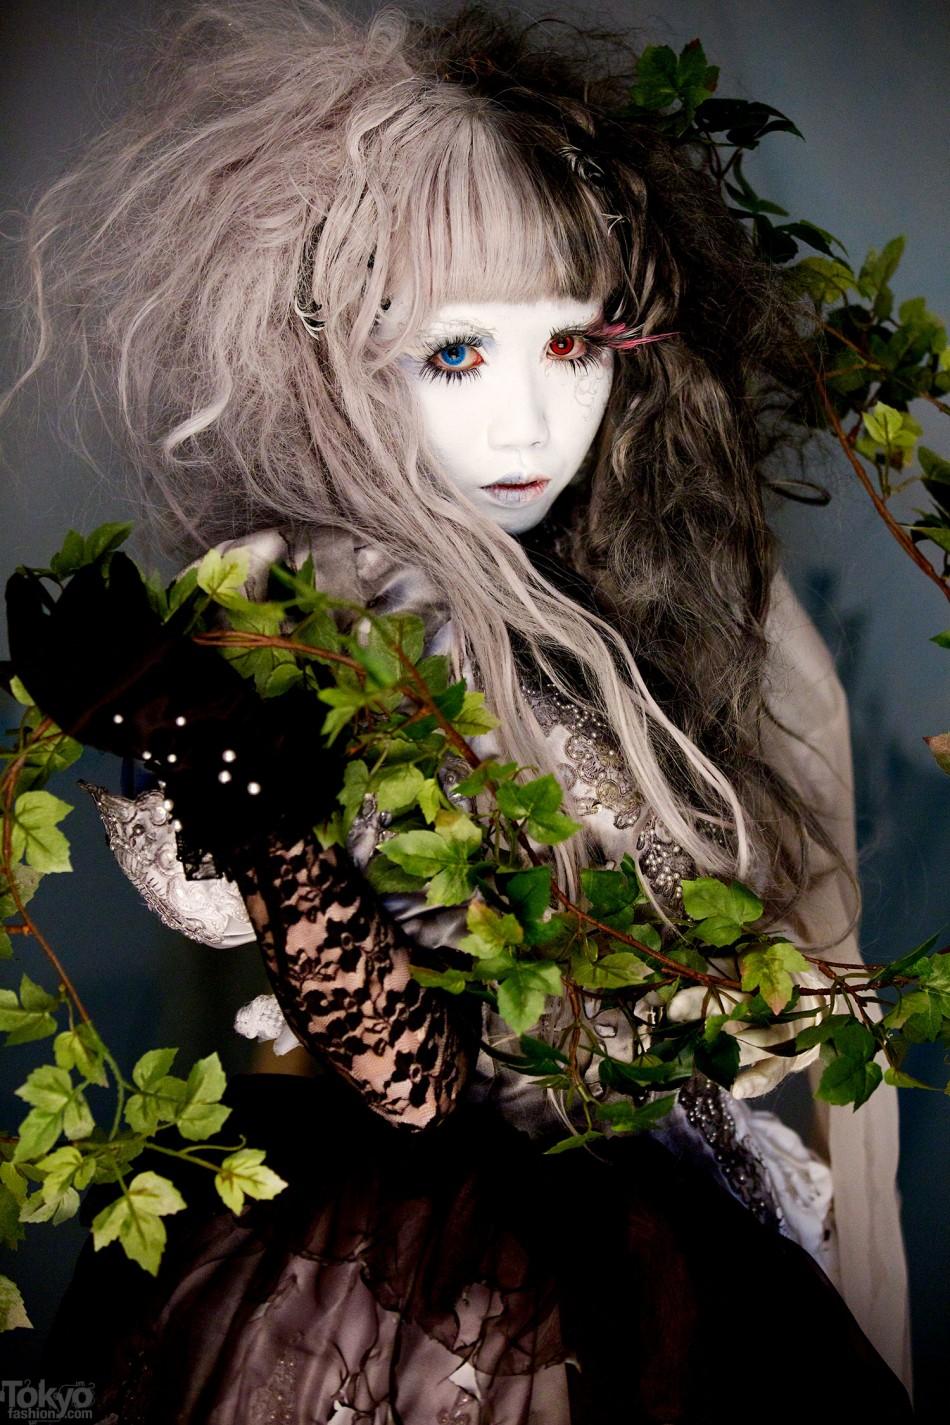 Minori - Her Memories of a Dream (10)